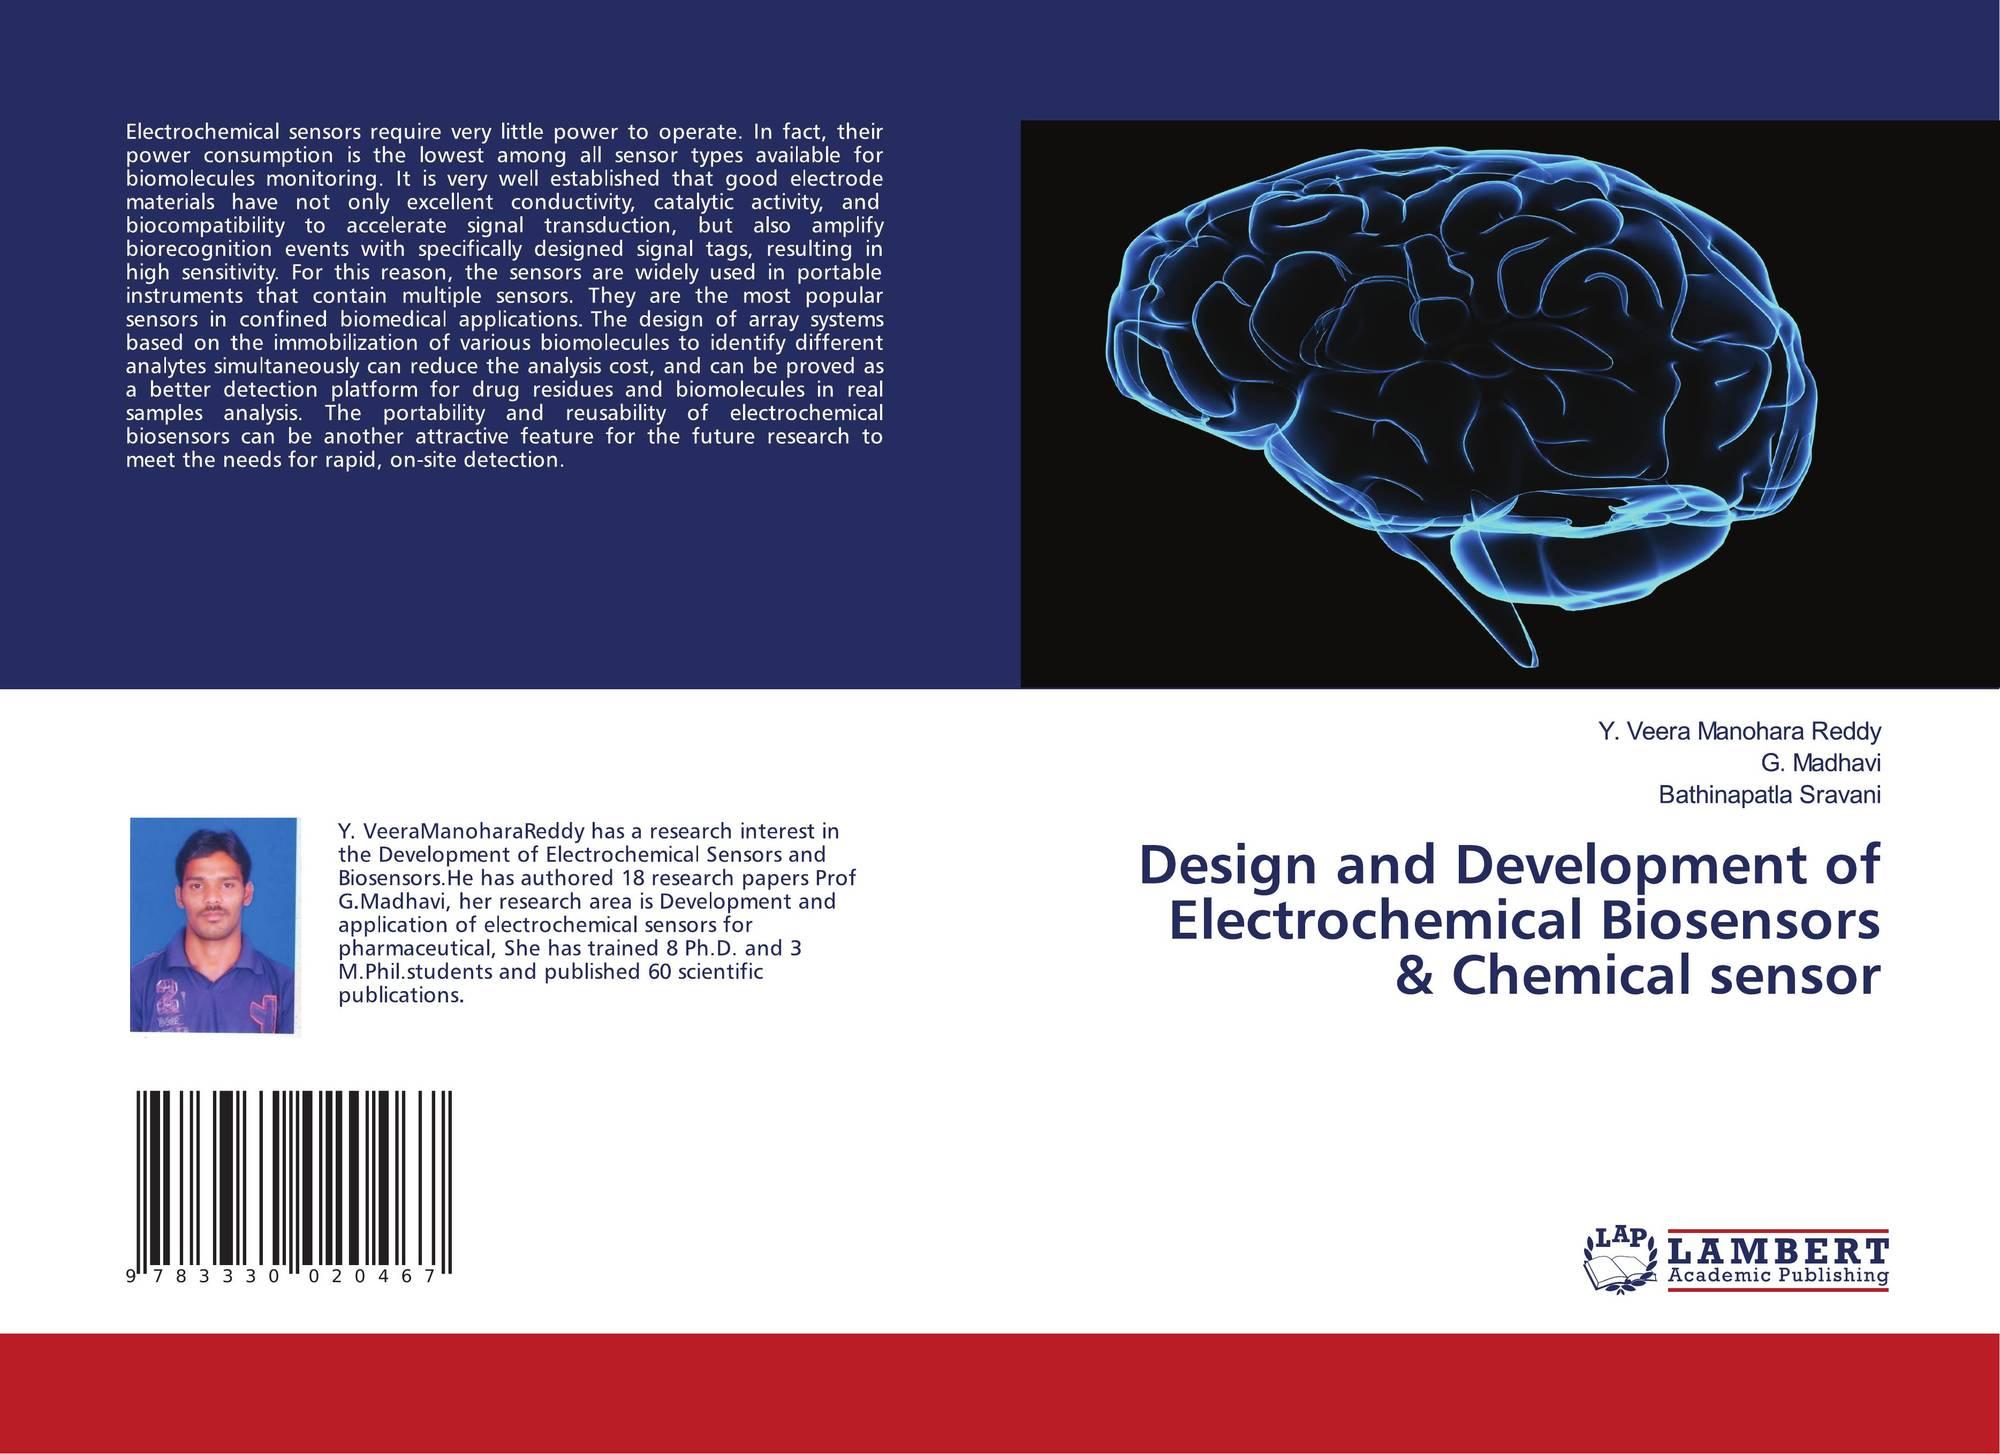 Design and Development of Electrochemical Biosensors